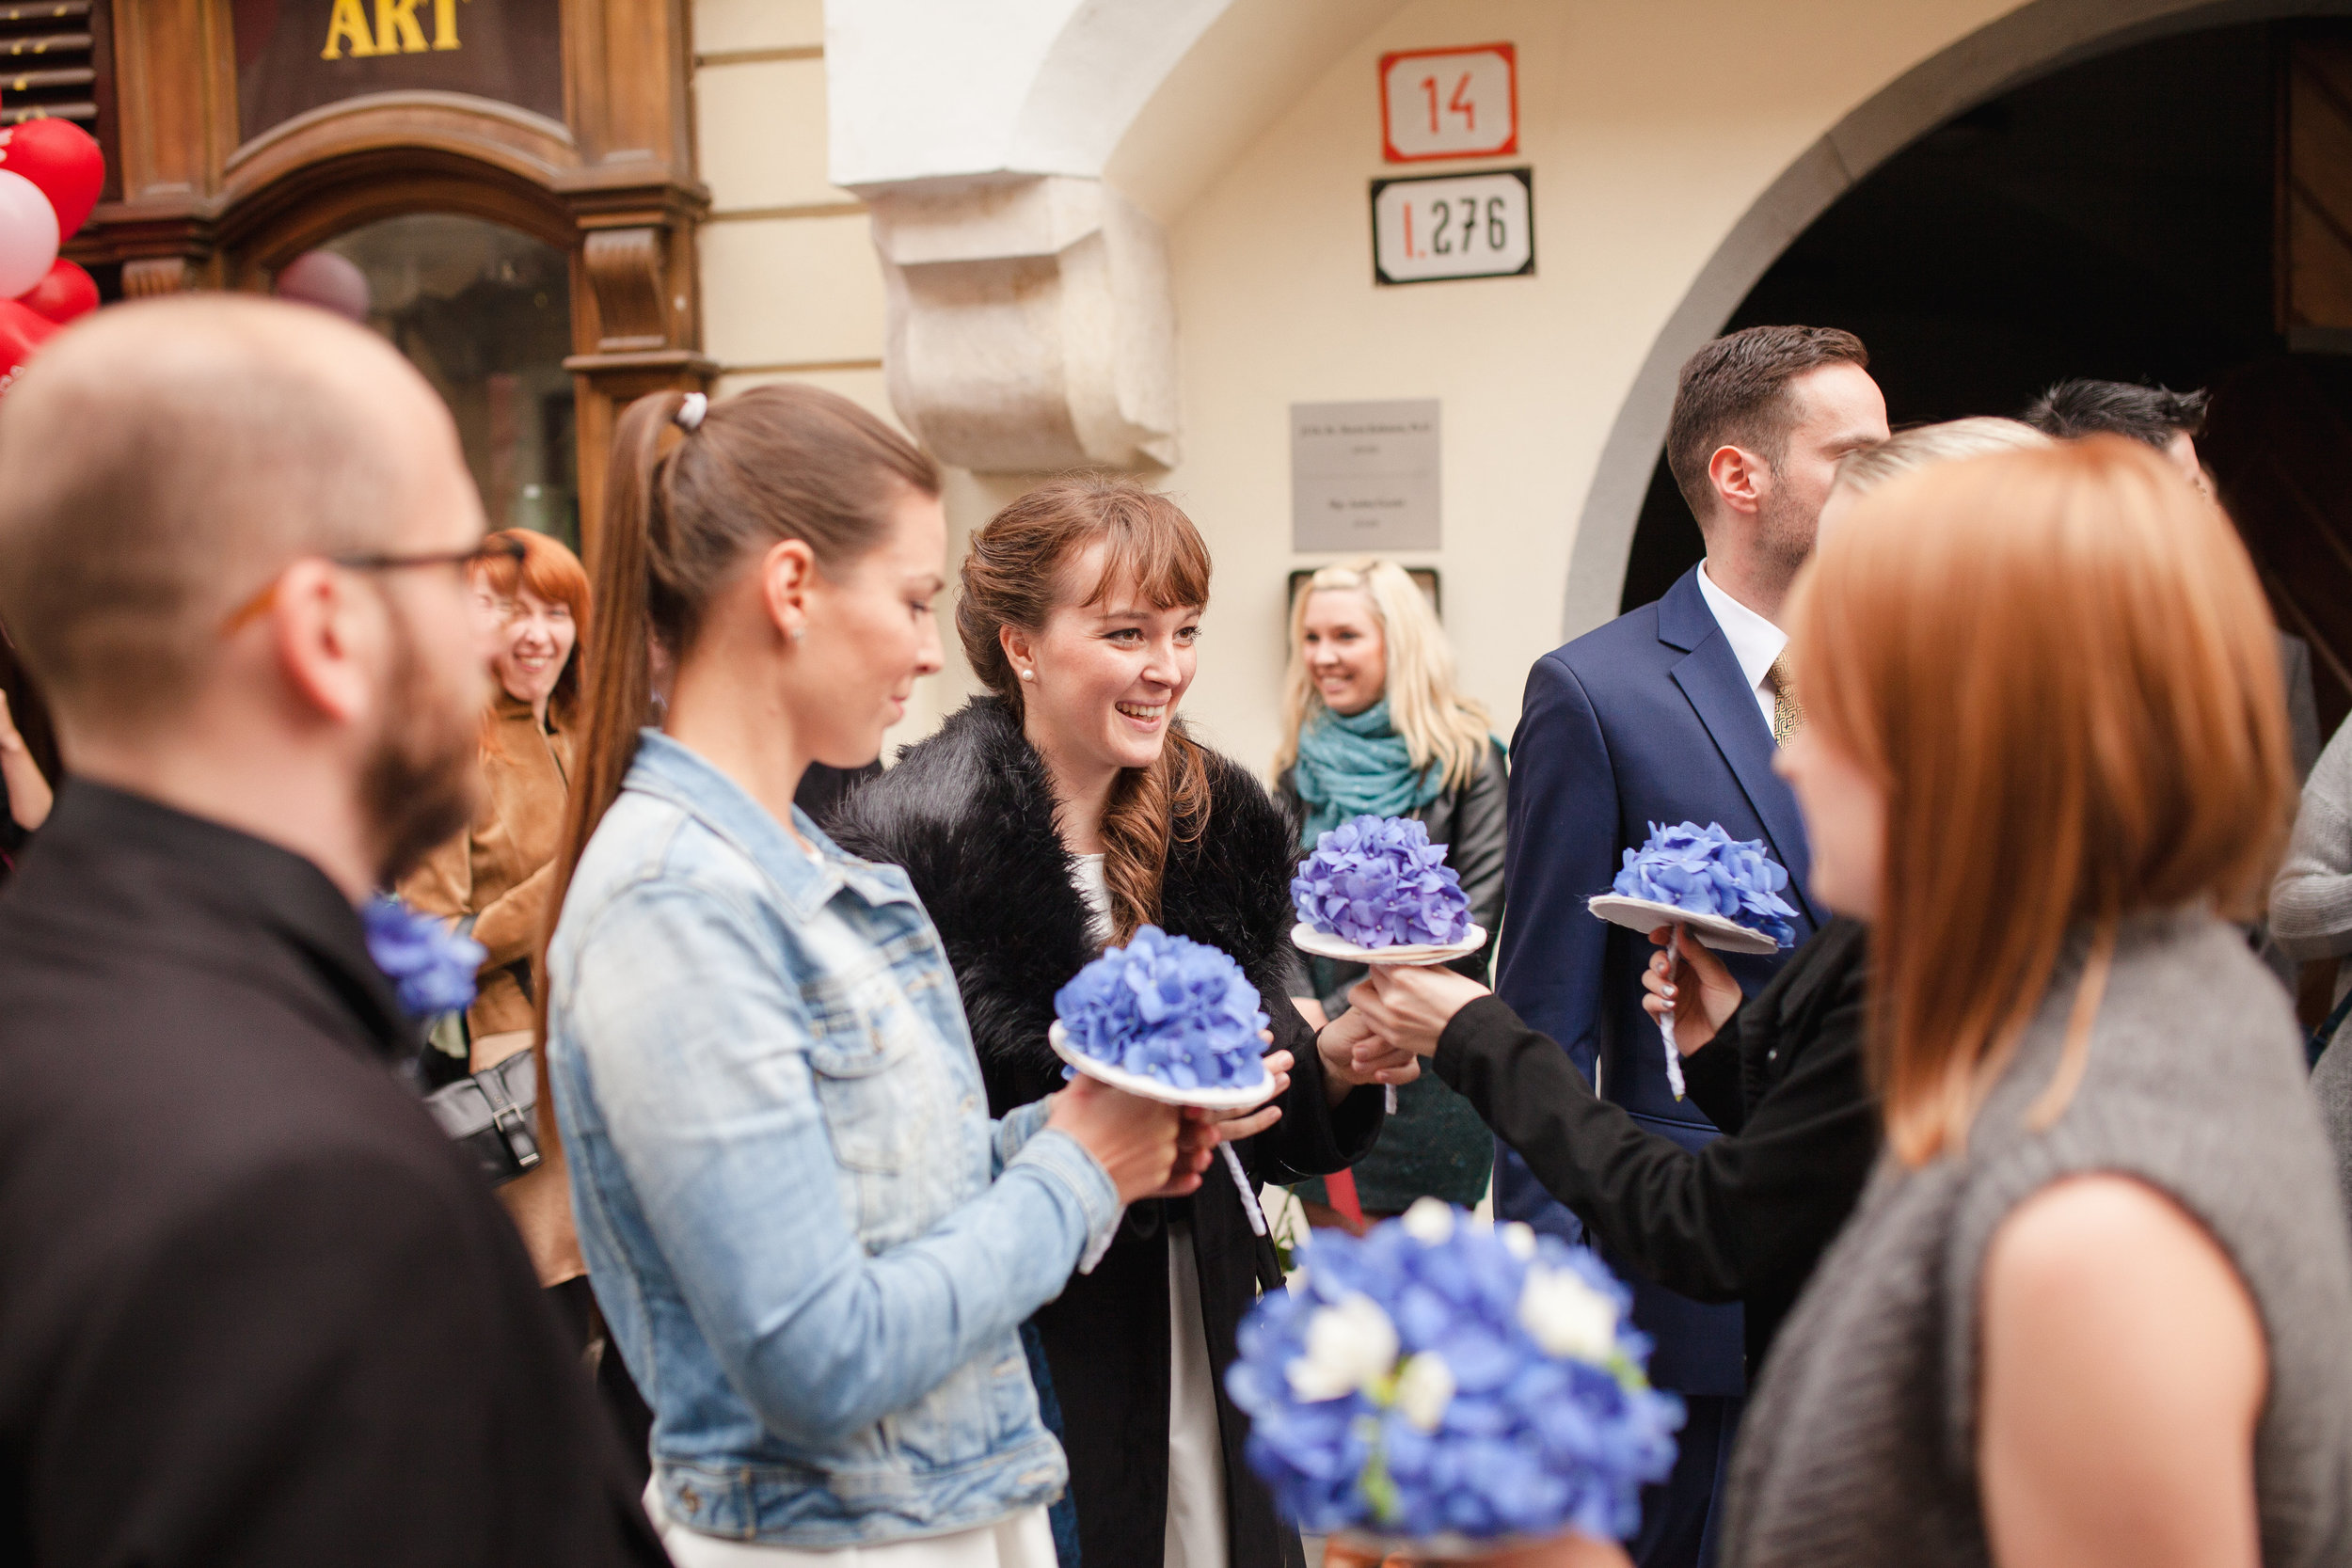 destination-wedding-photographer-bratislava-slovakia-europe-documentary-3.jpg